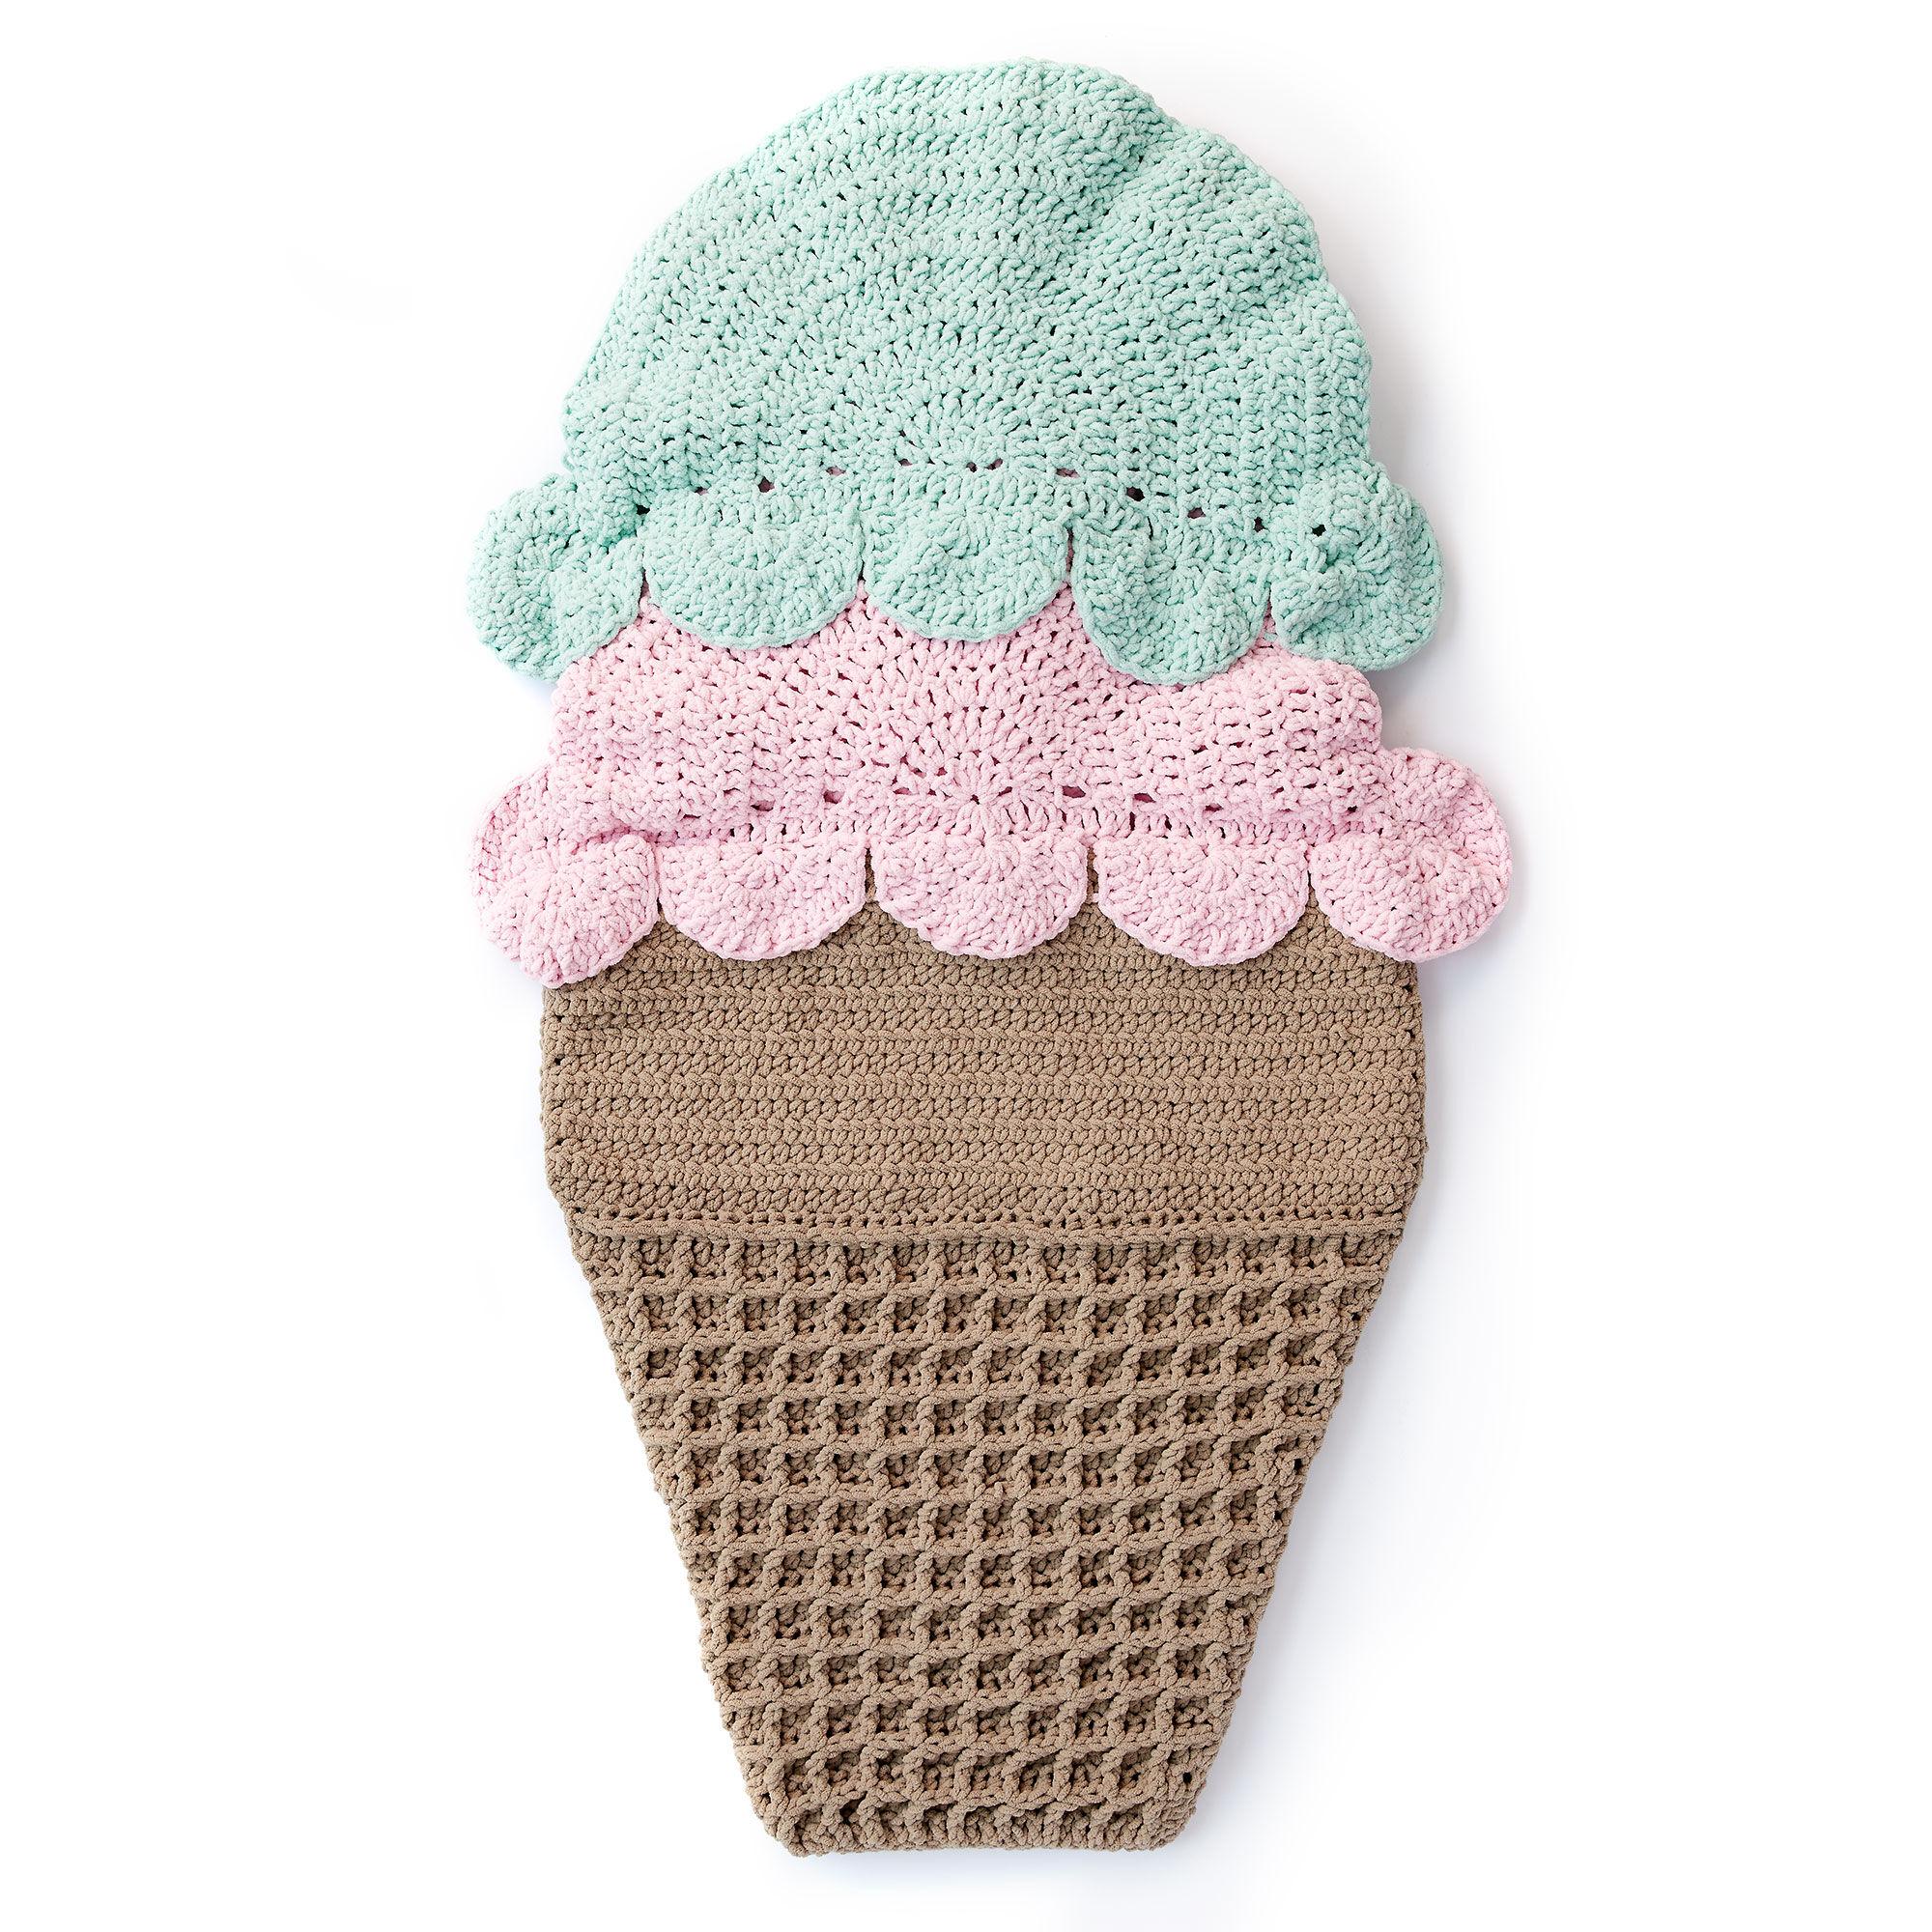 Bernat Double Scoop Crochet Snuggle Sack | Yarnspirations